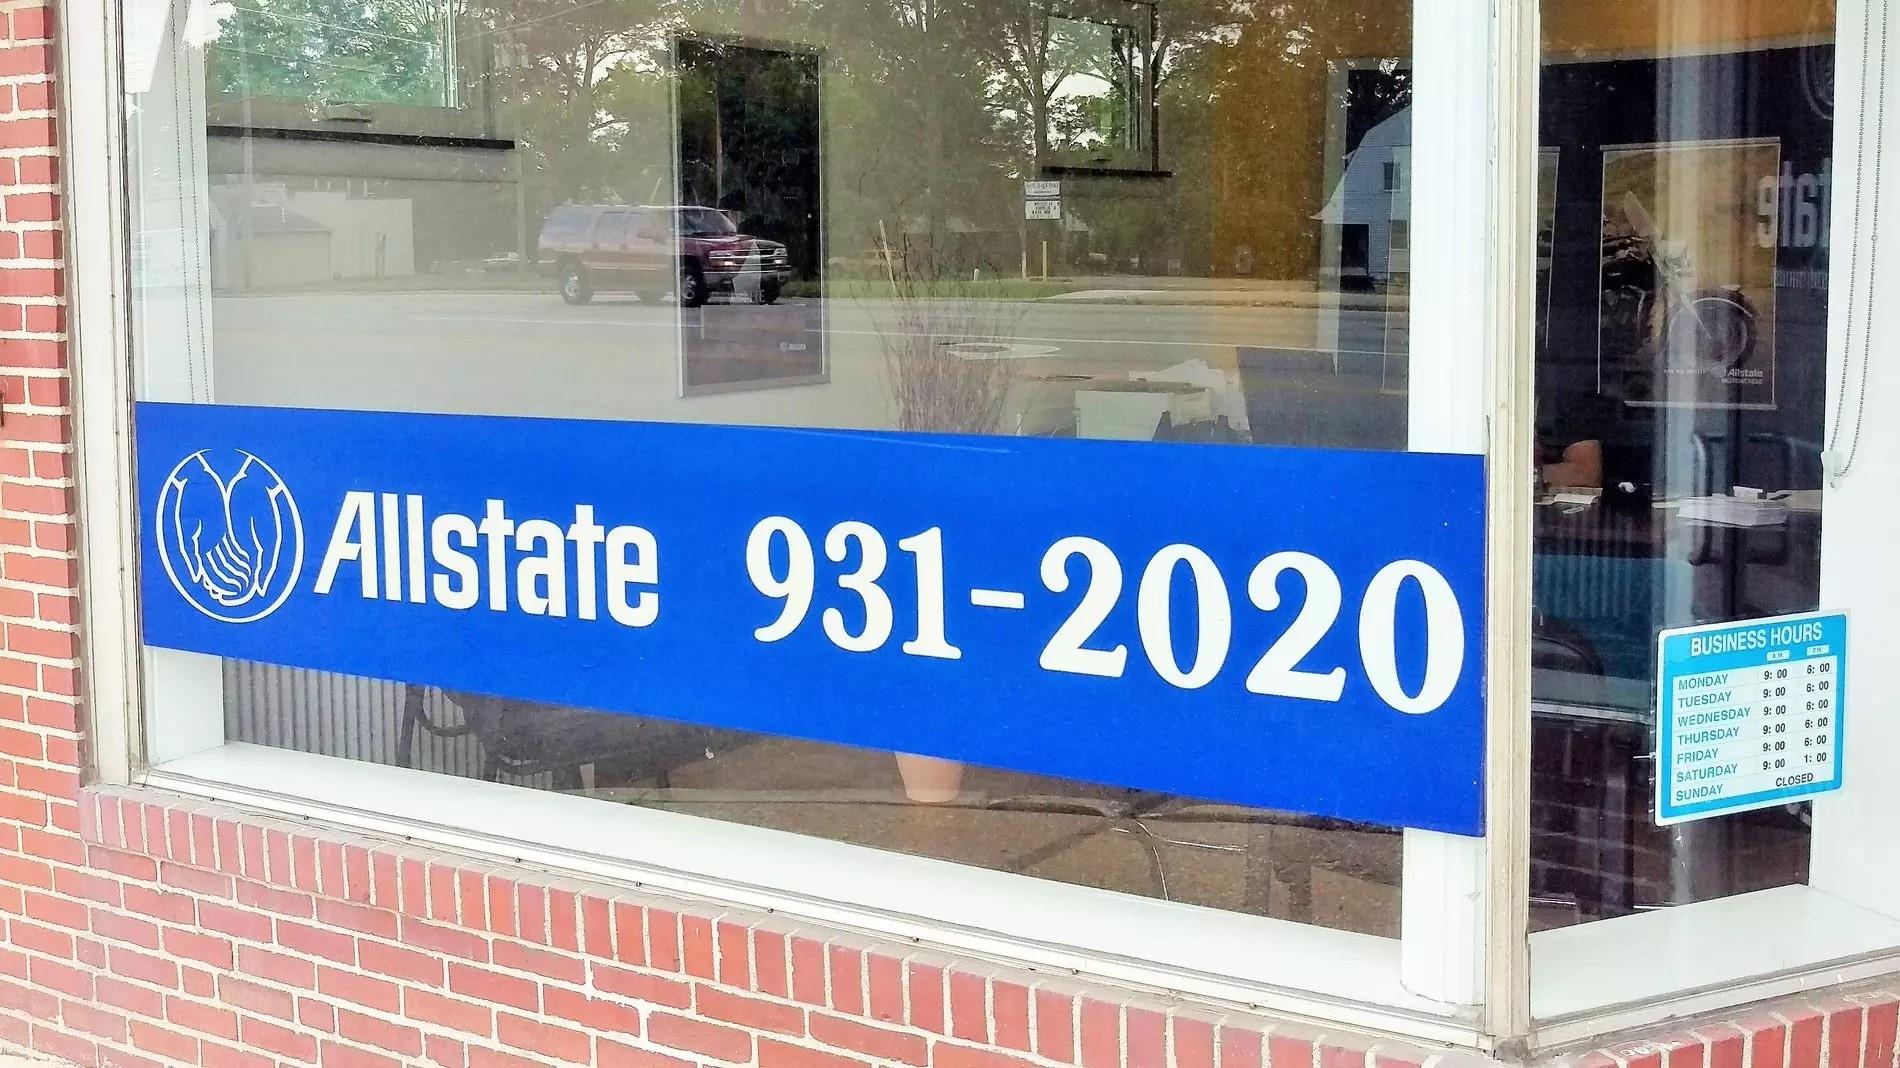 Charlie Broxterman: Allstate Insurance image 3